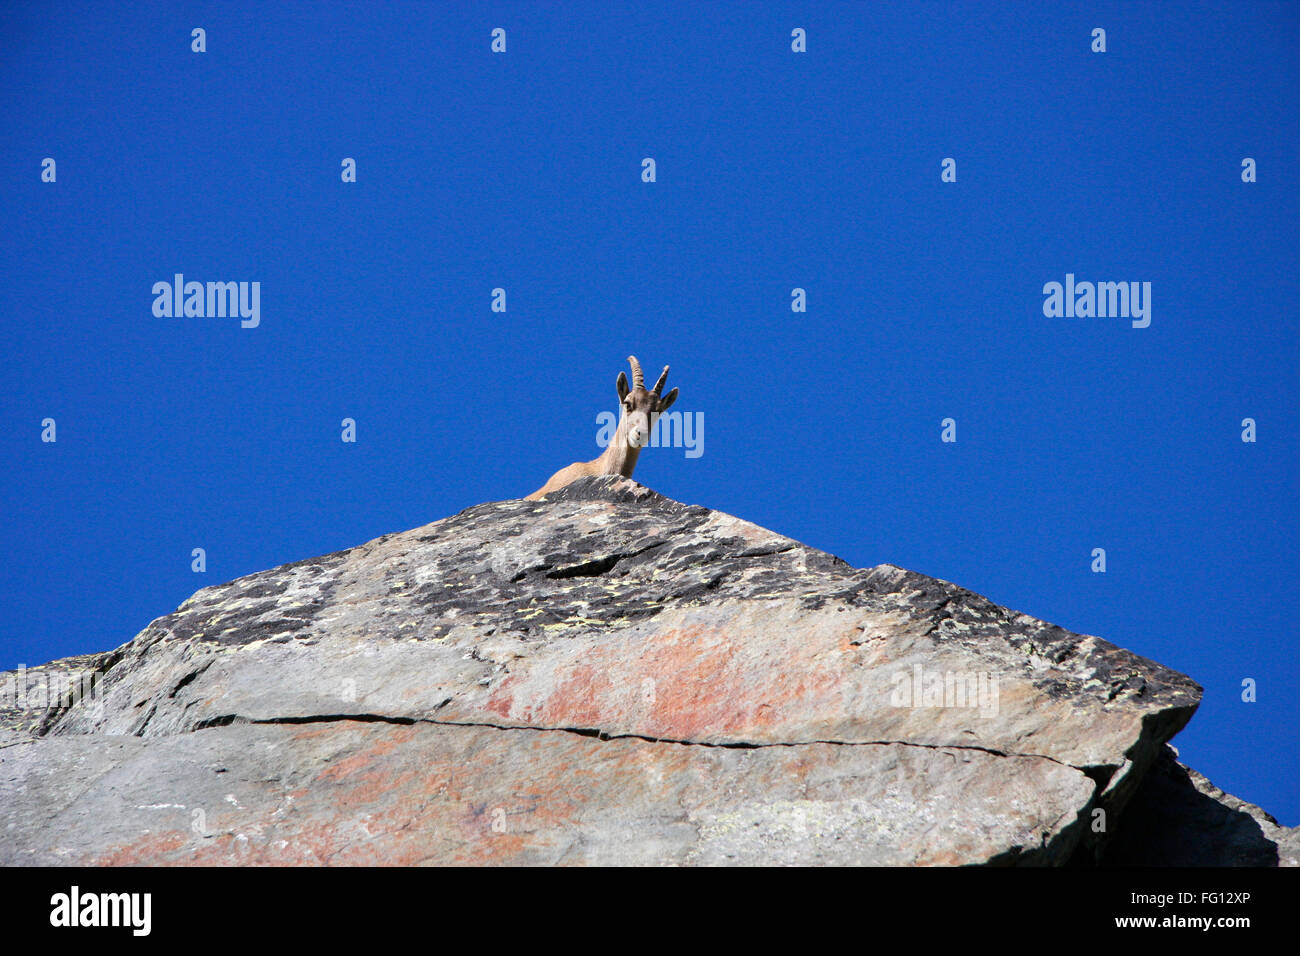 Steinbock, schweizer Alpen. - Stock Image